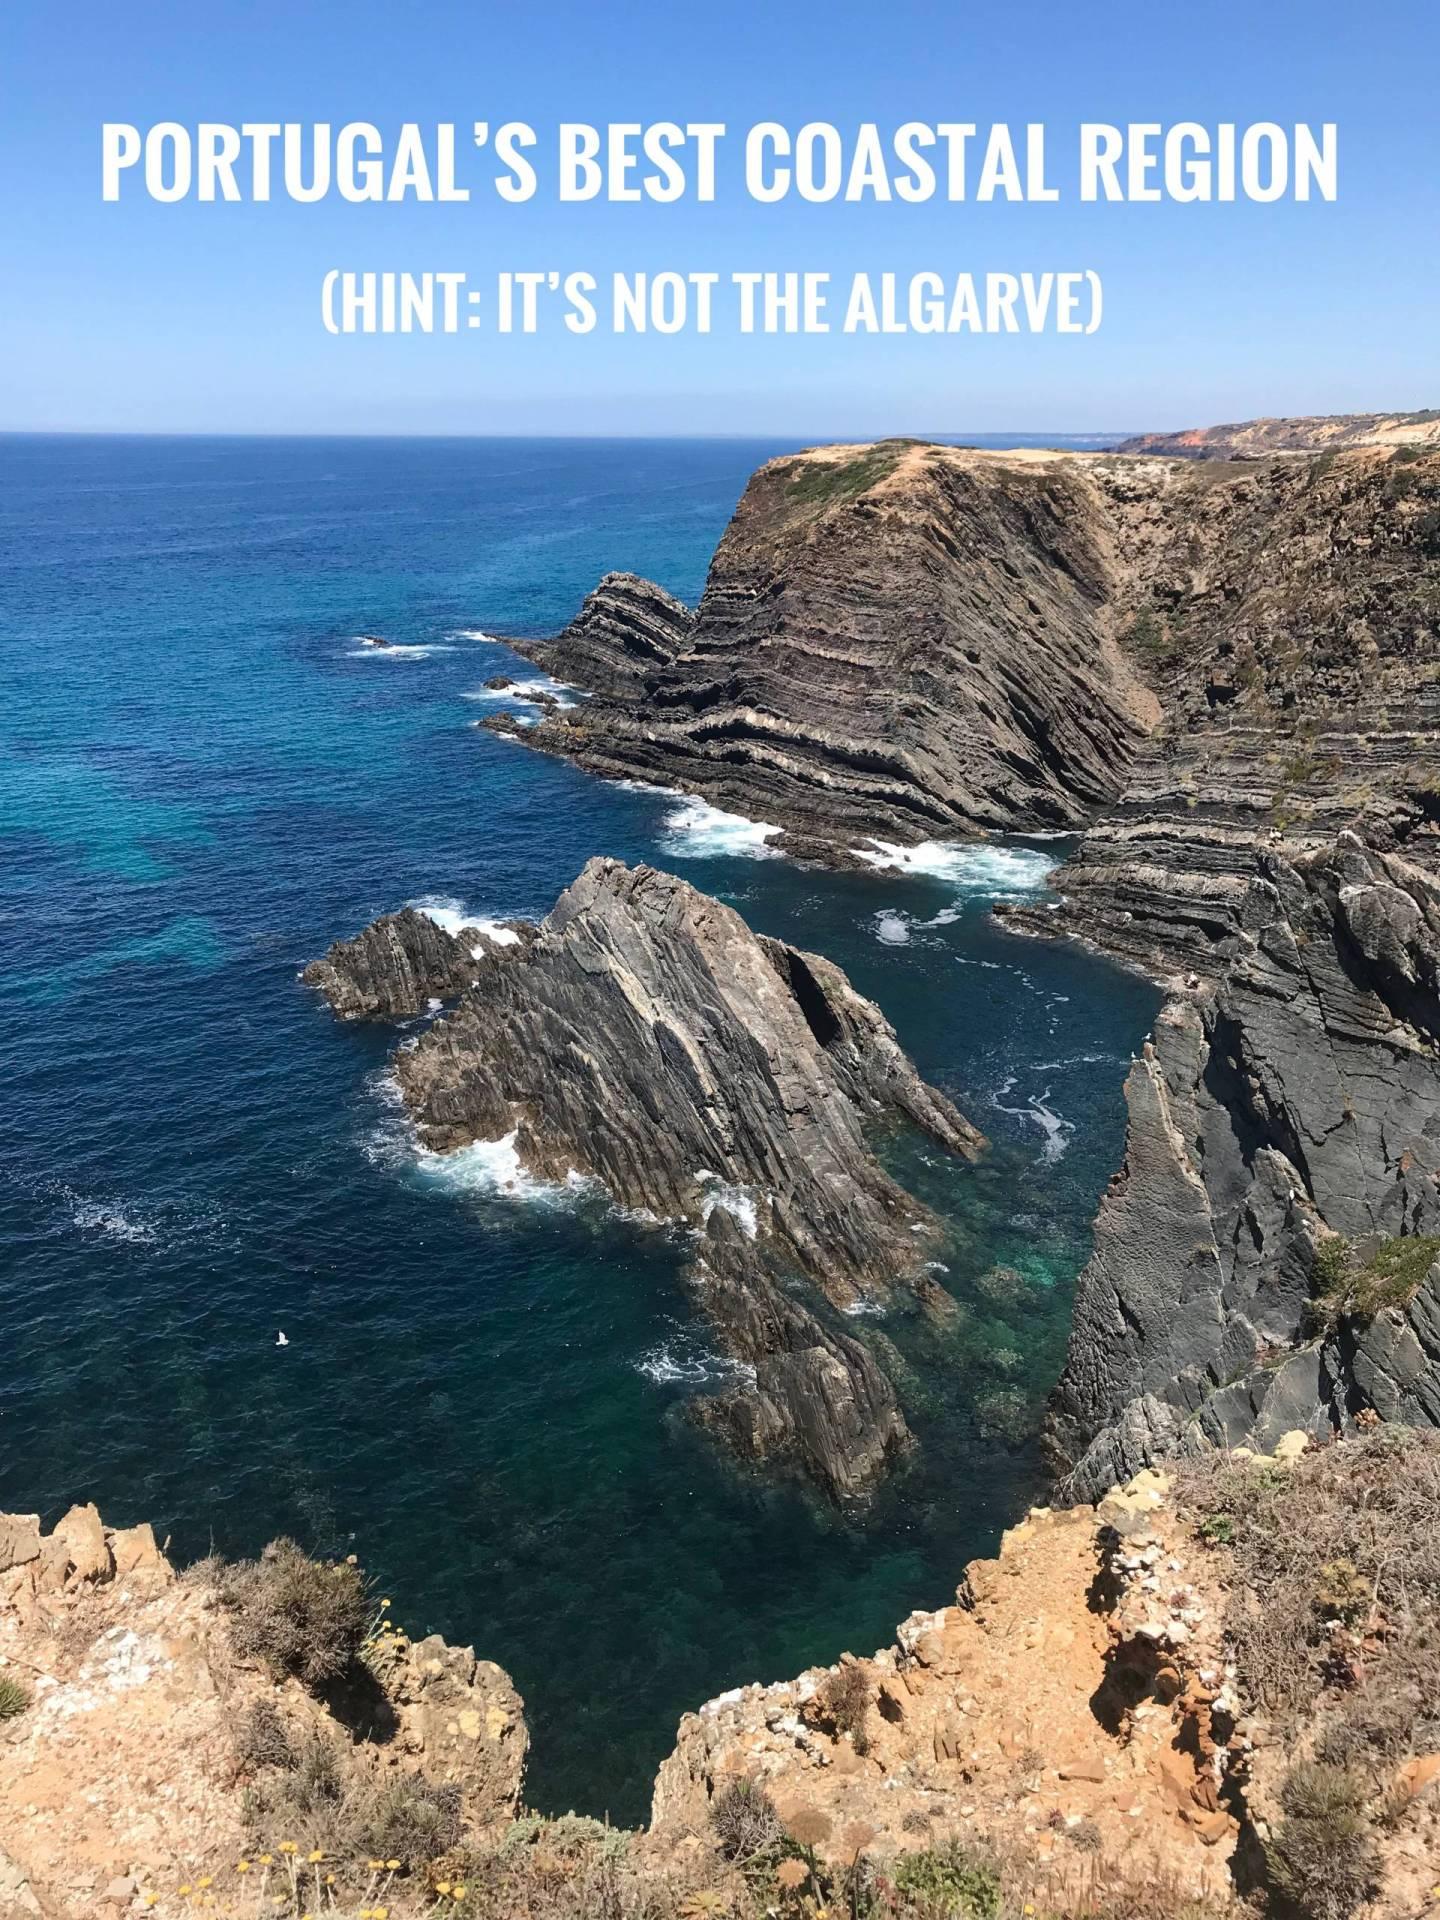 Portugal's Best Coastal Region (Hint: it's not the Algarve)